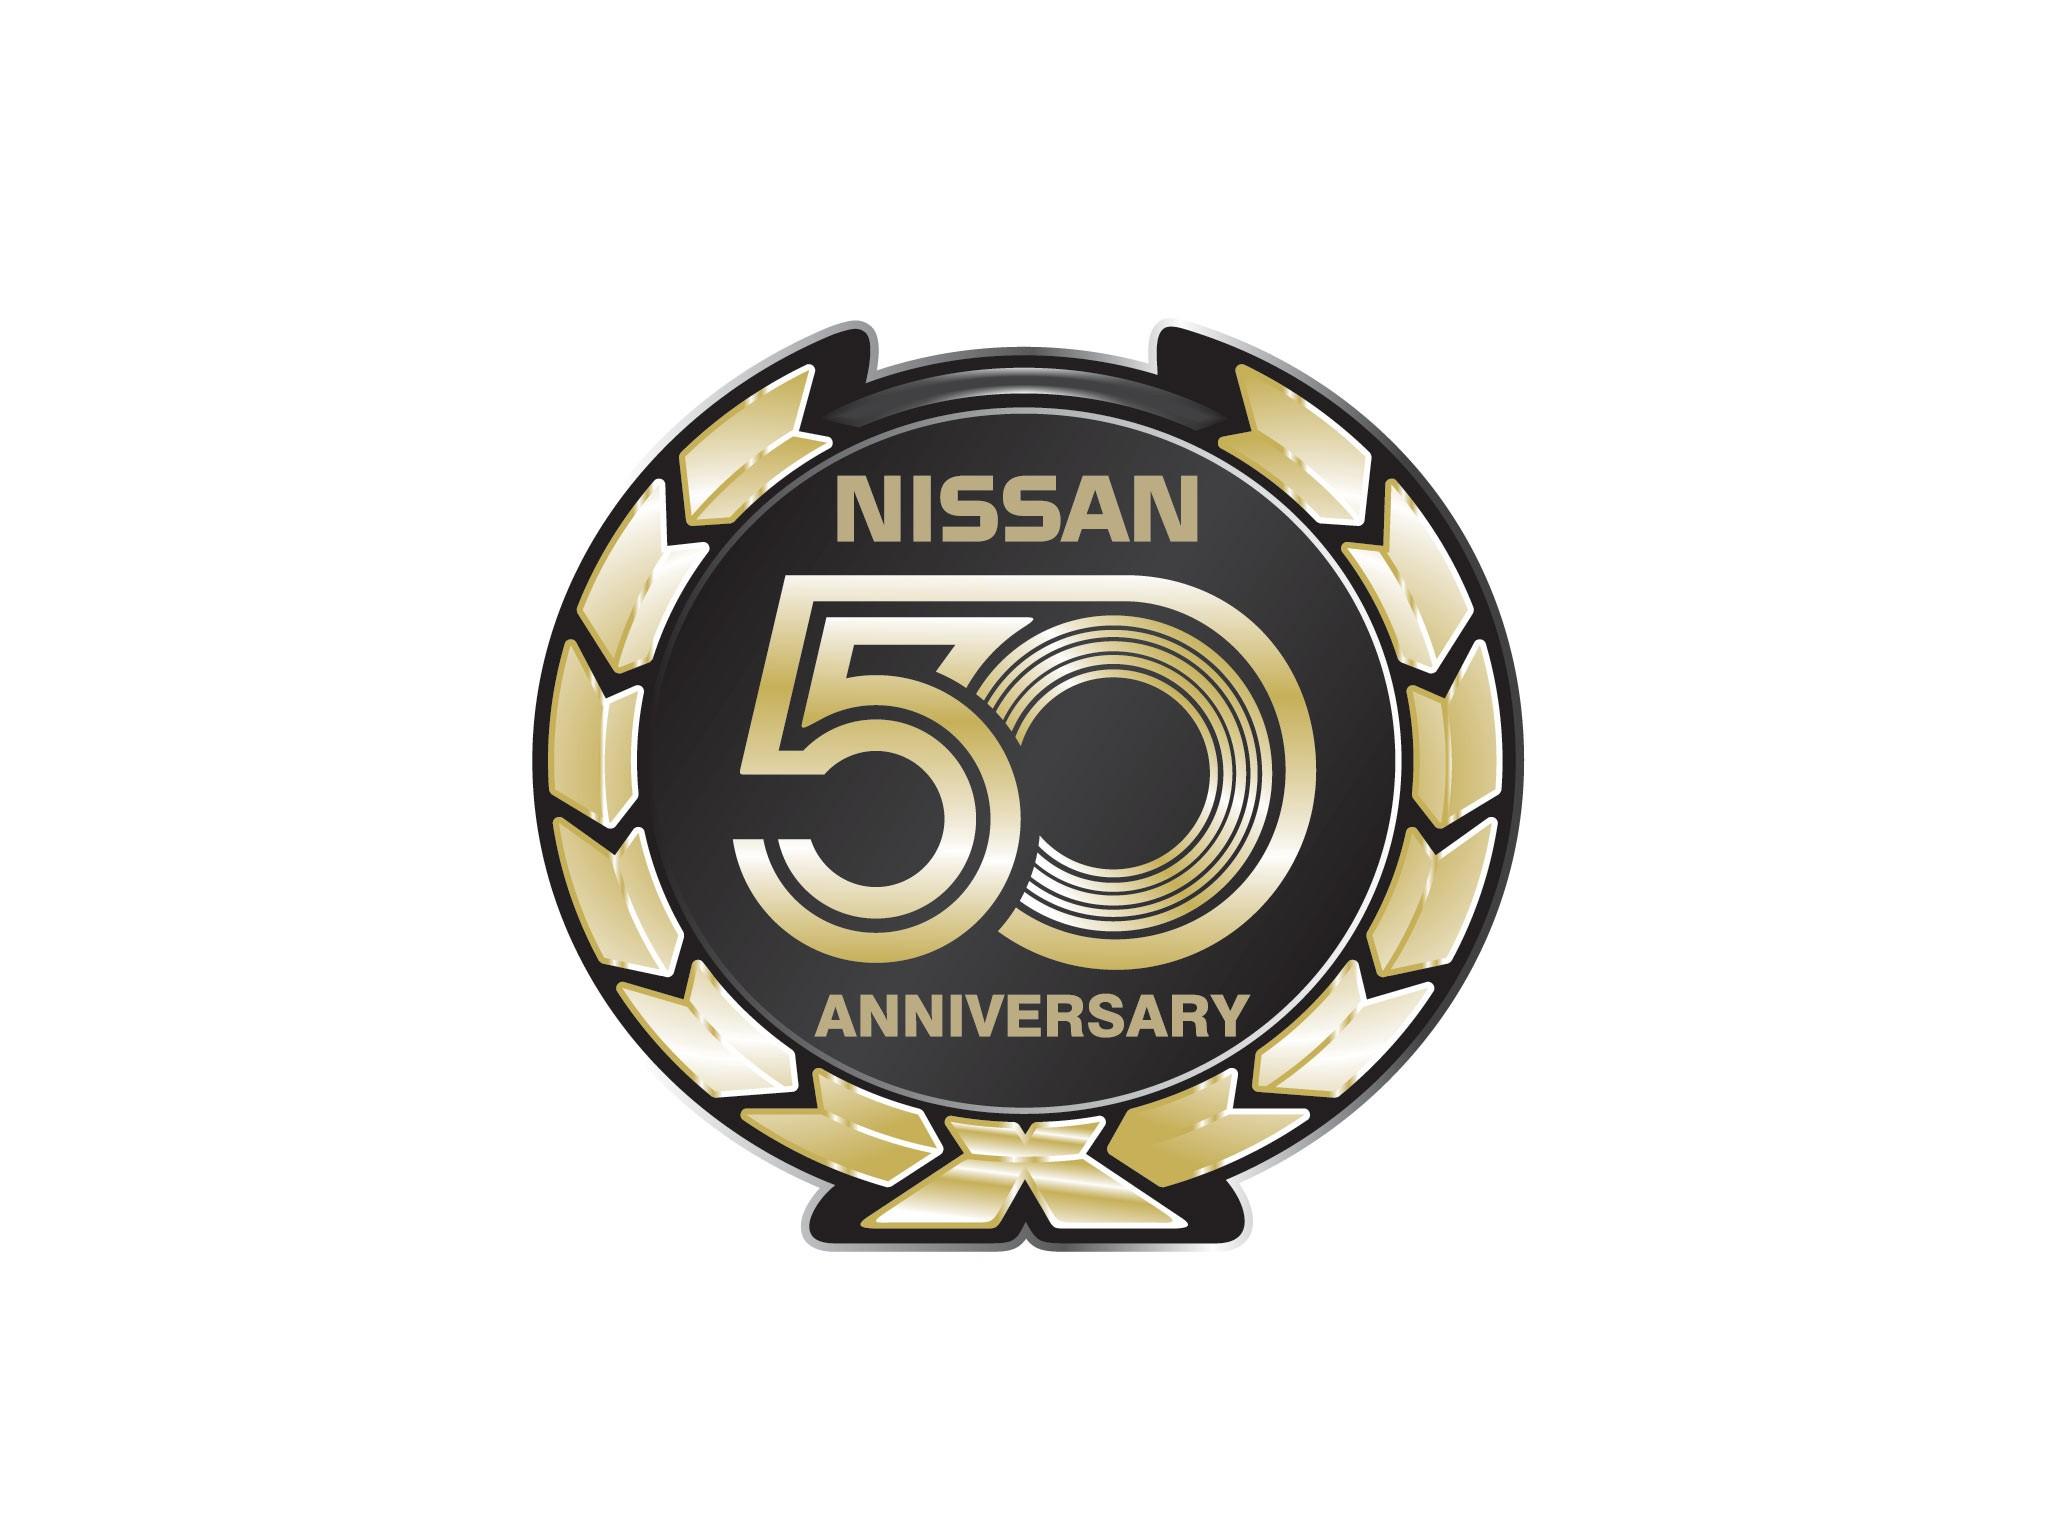 Nissan 50 Year